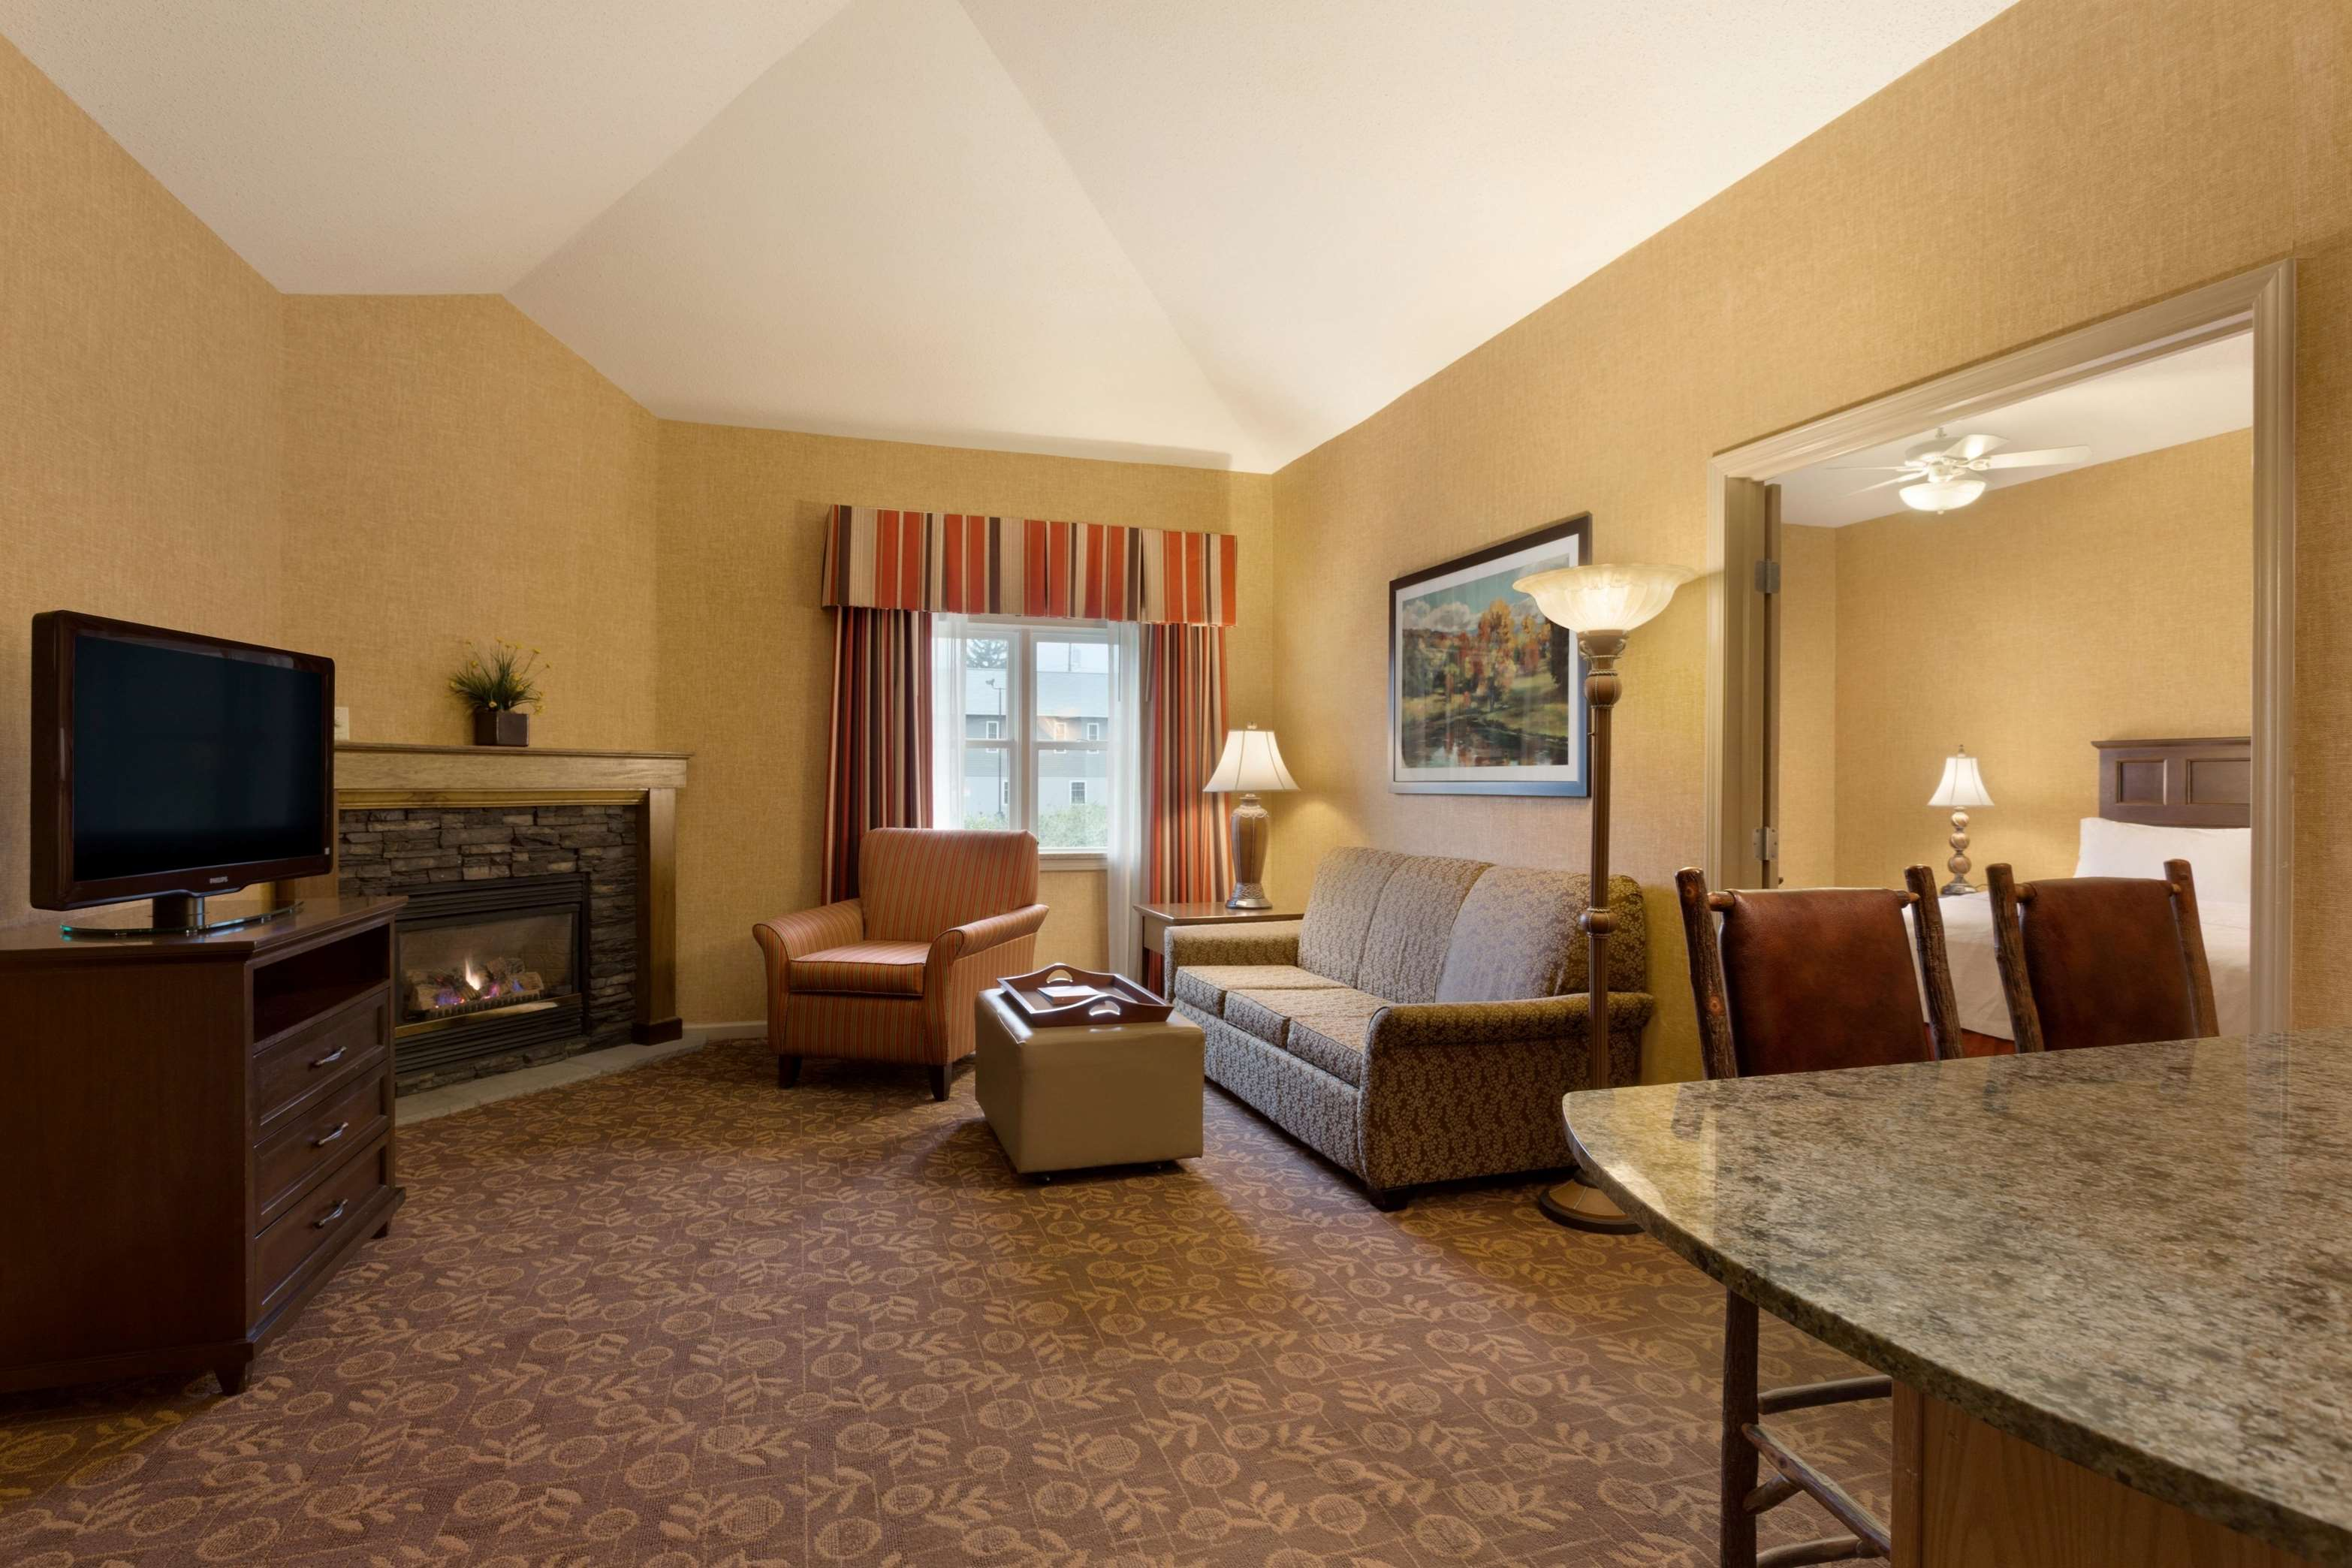 Homewood Suites by Hilton Syracuse/Liverpool image 19